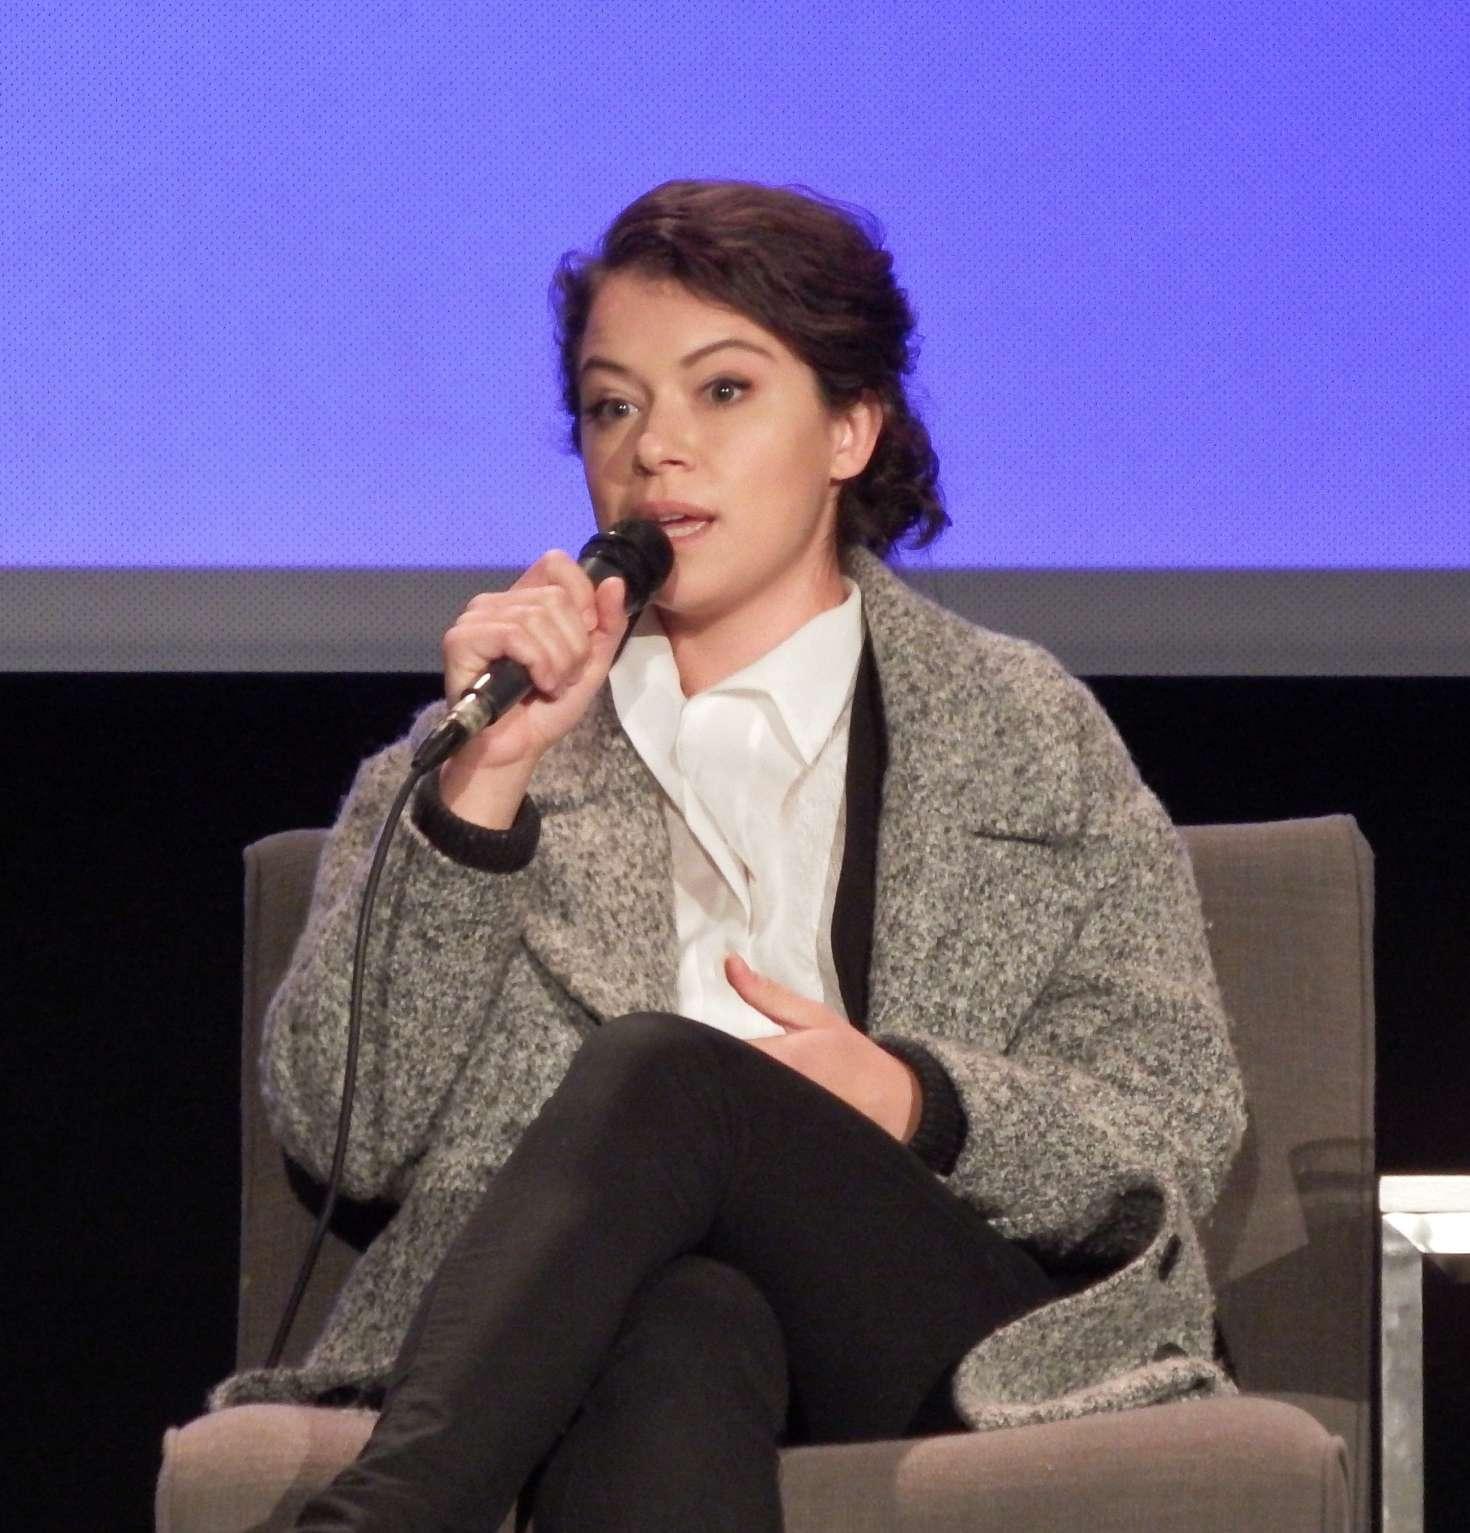 Uncategorized 2016 : Tatiana Maslany: Speaks at the VIFF in Vancouver-14